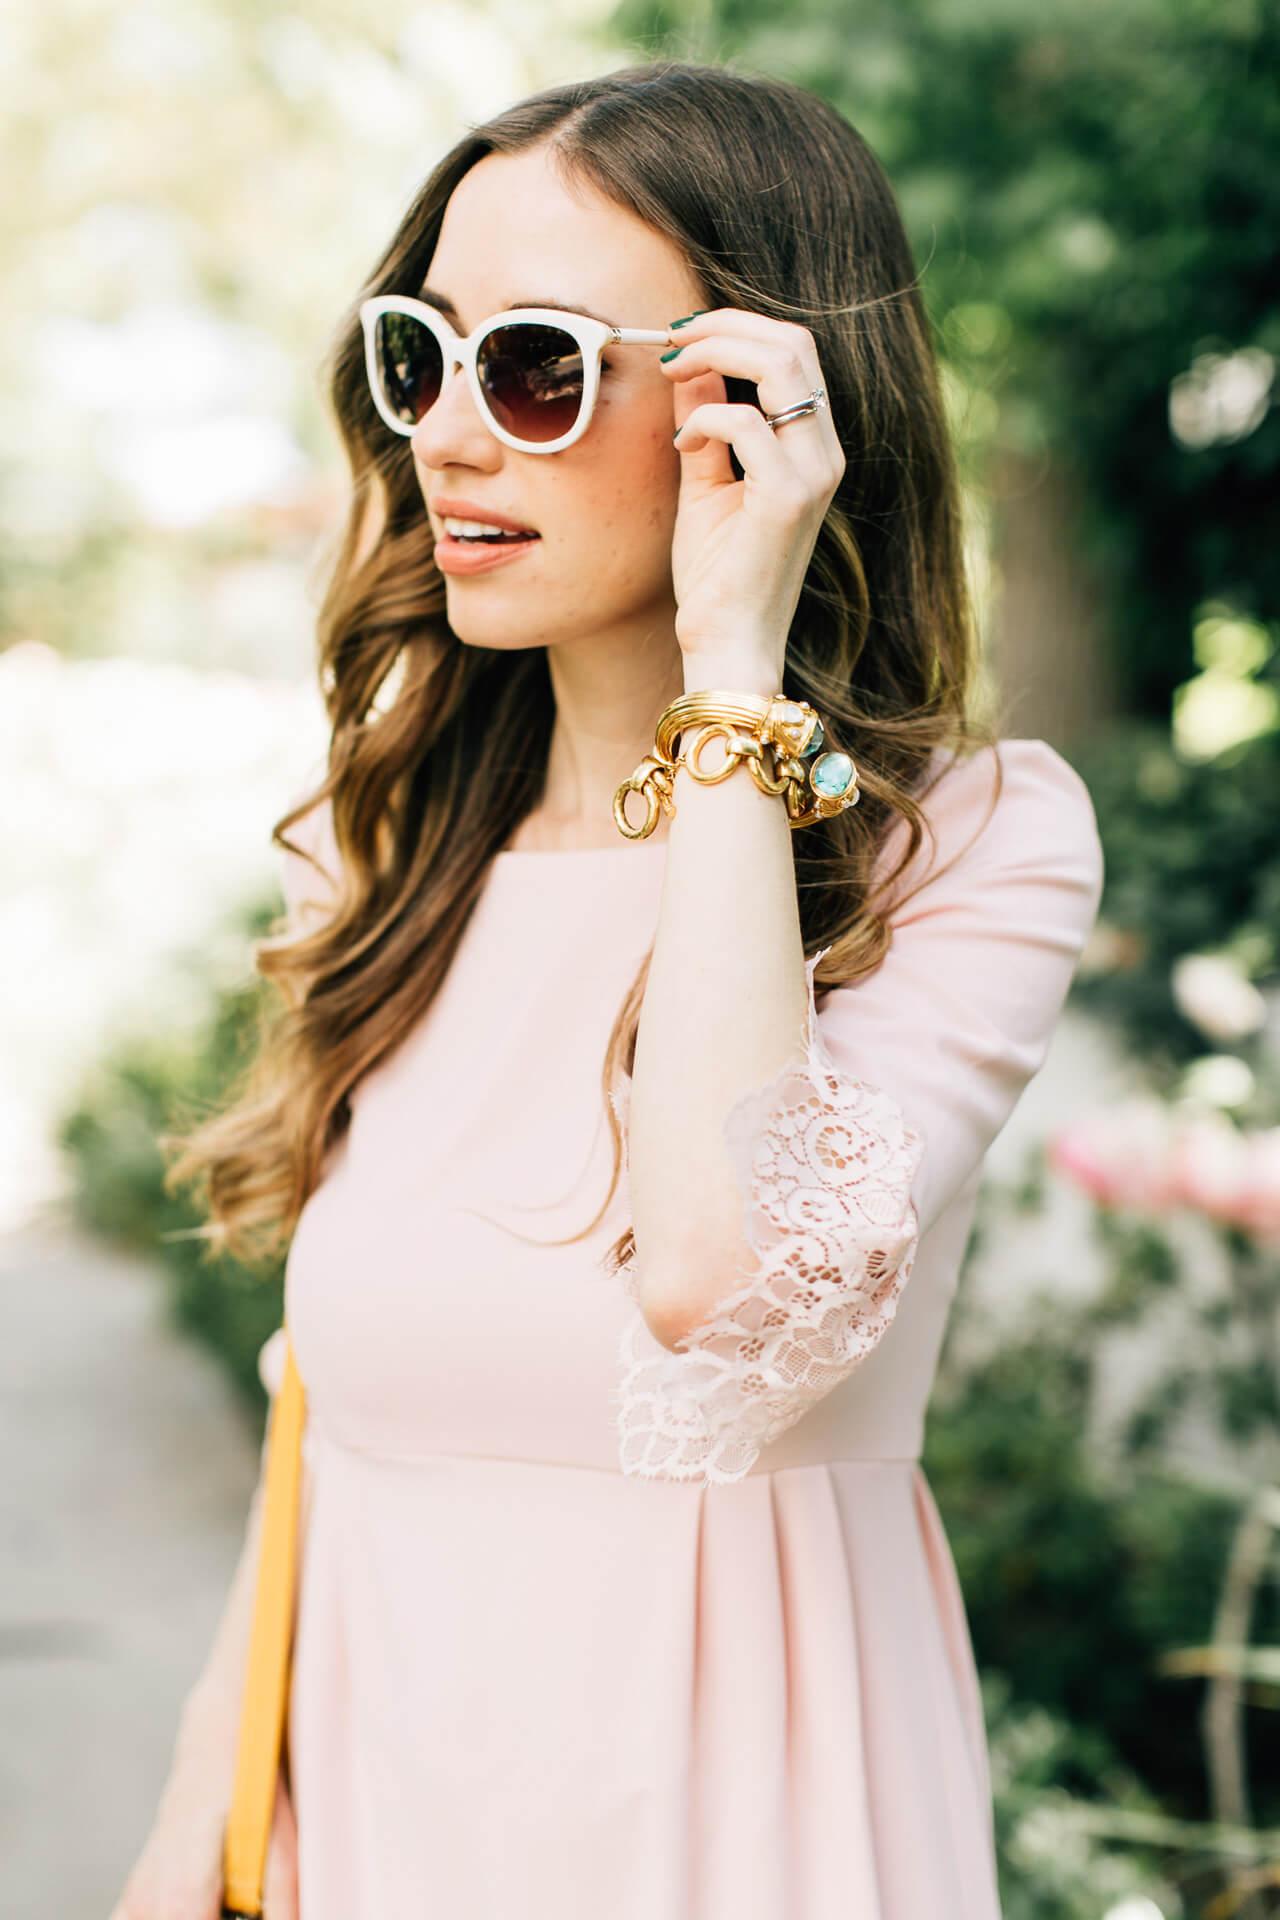 los angeles feminine style blogger M Loves M - @marmar